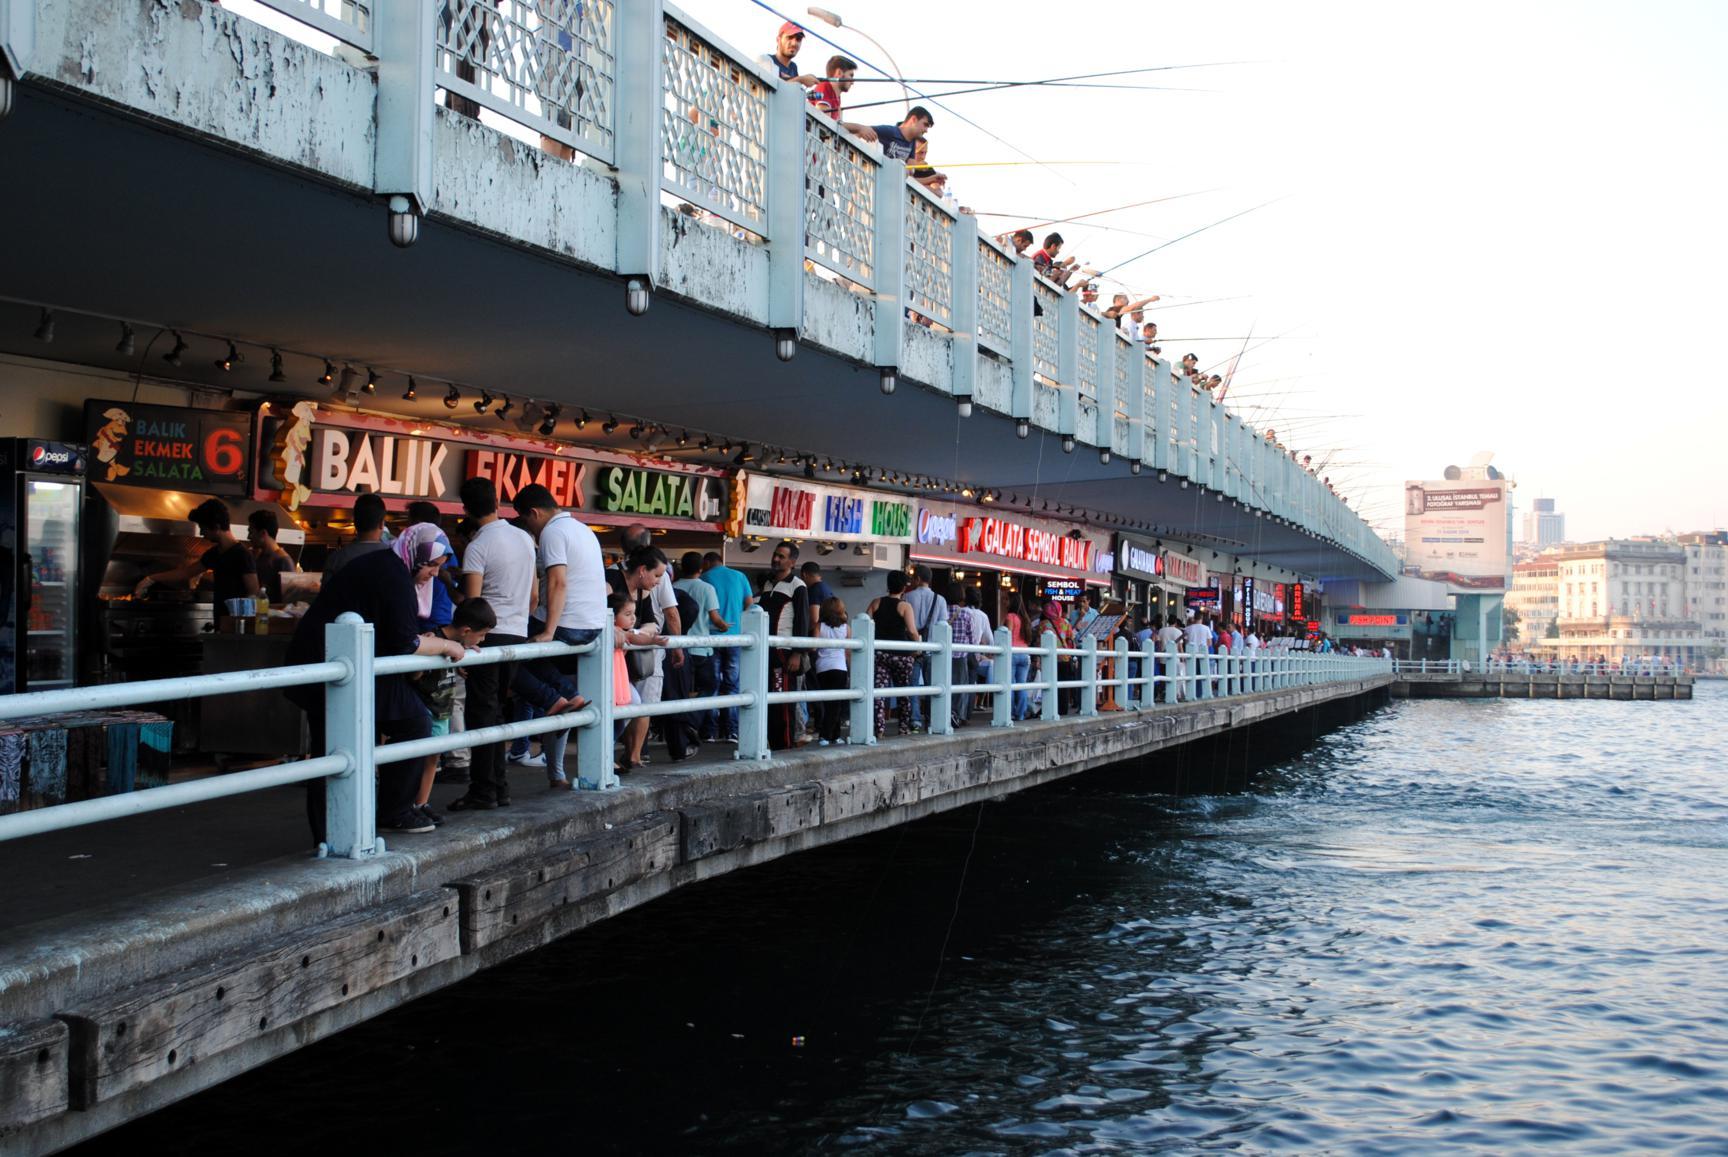 restaurantes-puente-galata-1